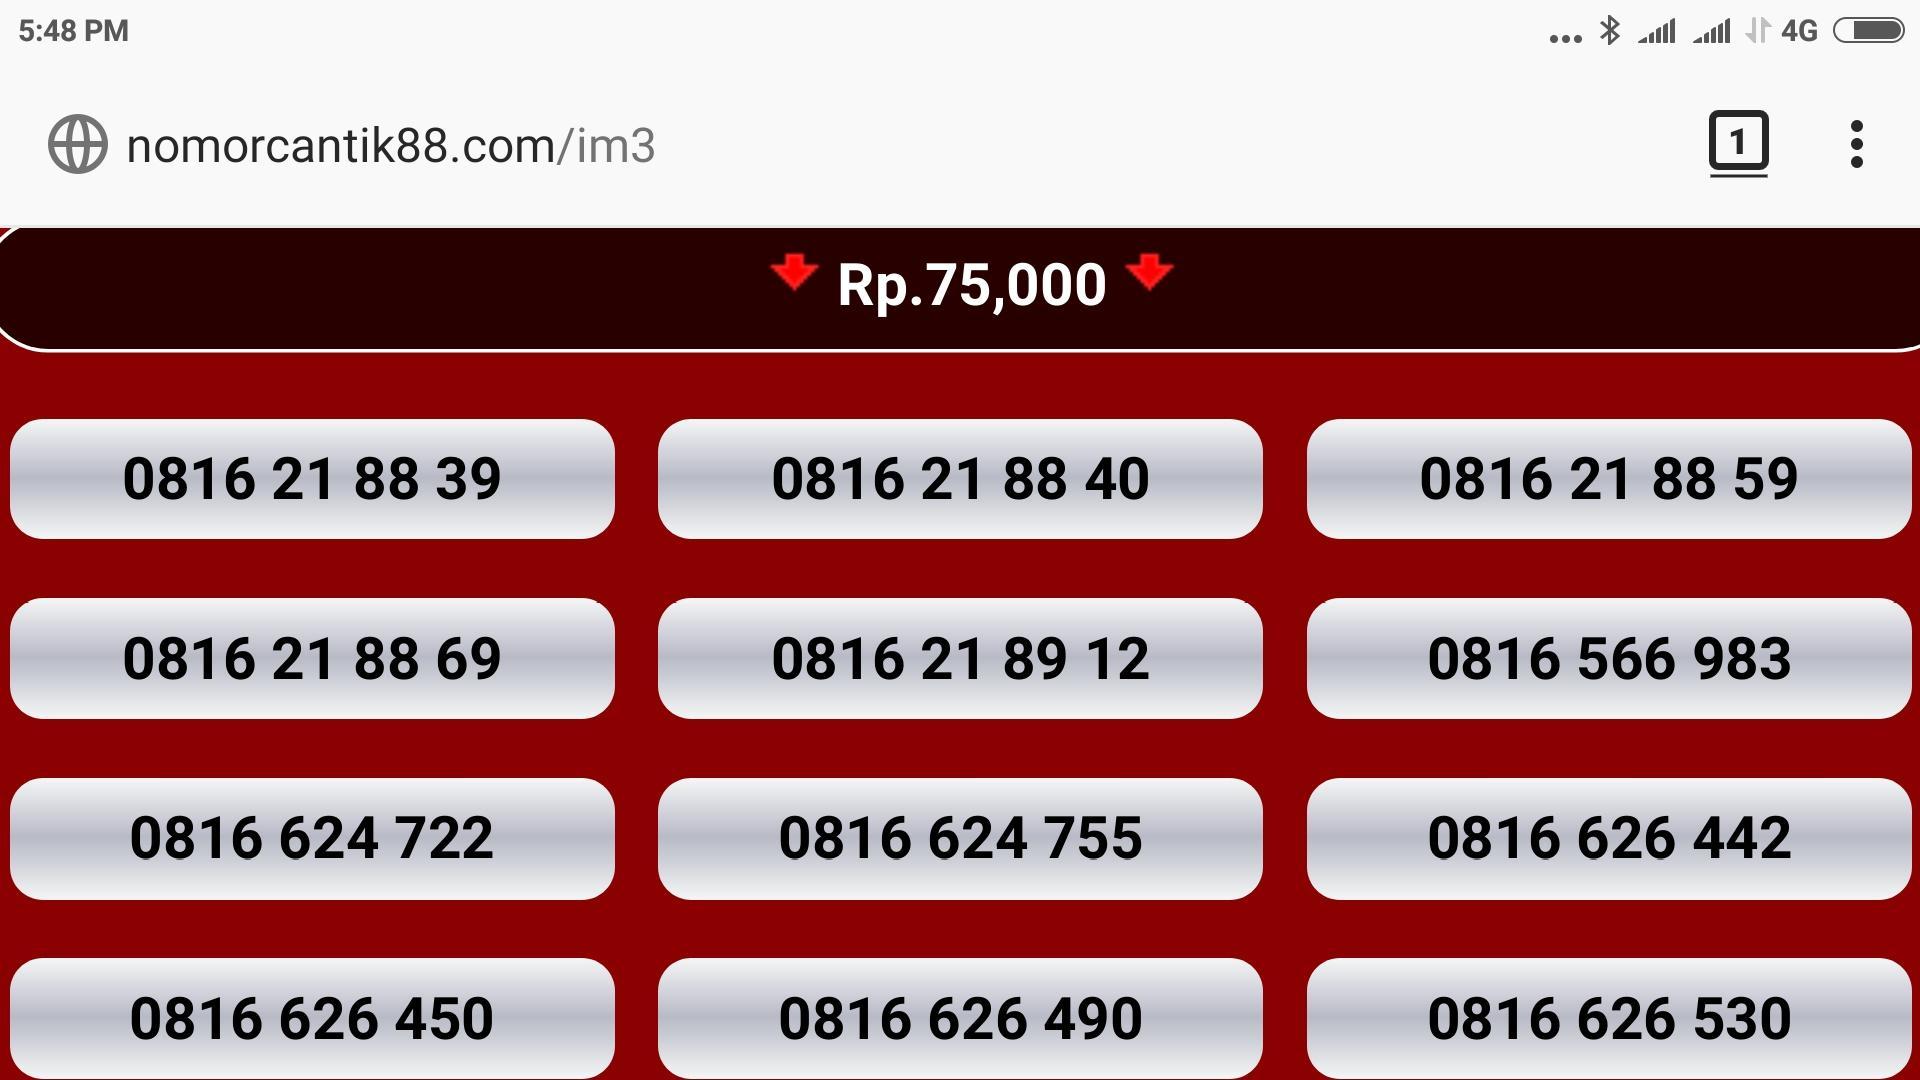 Kartu Sim Perdana Selular Tsel Kuota 9gb Nomor Cantik Im3 Indosat Nocan Gsm 10 Digit 3g 4g 0816 Mentari Prabayar Super